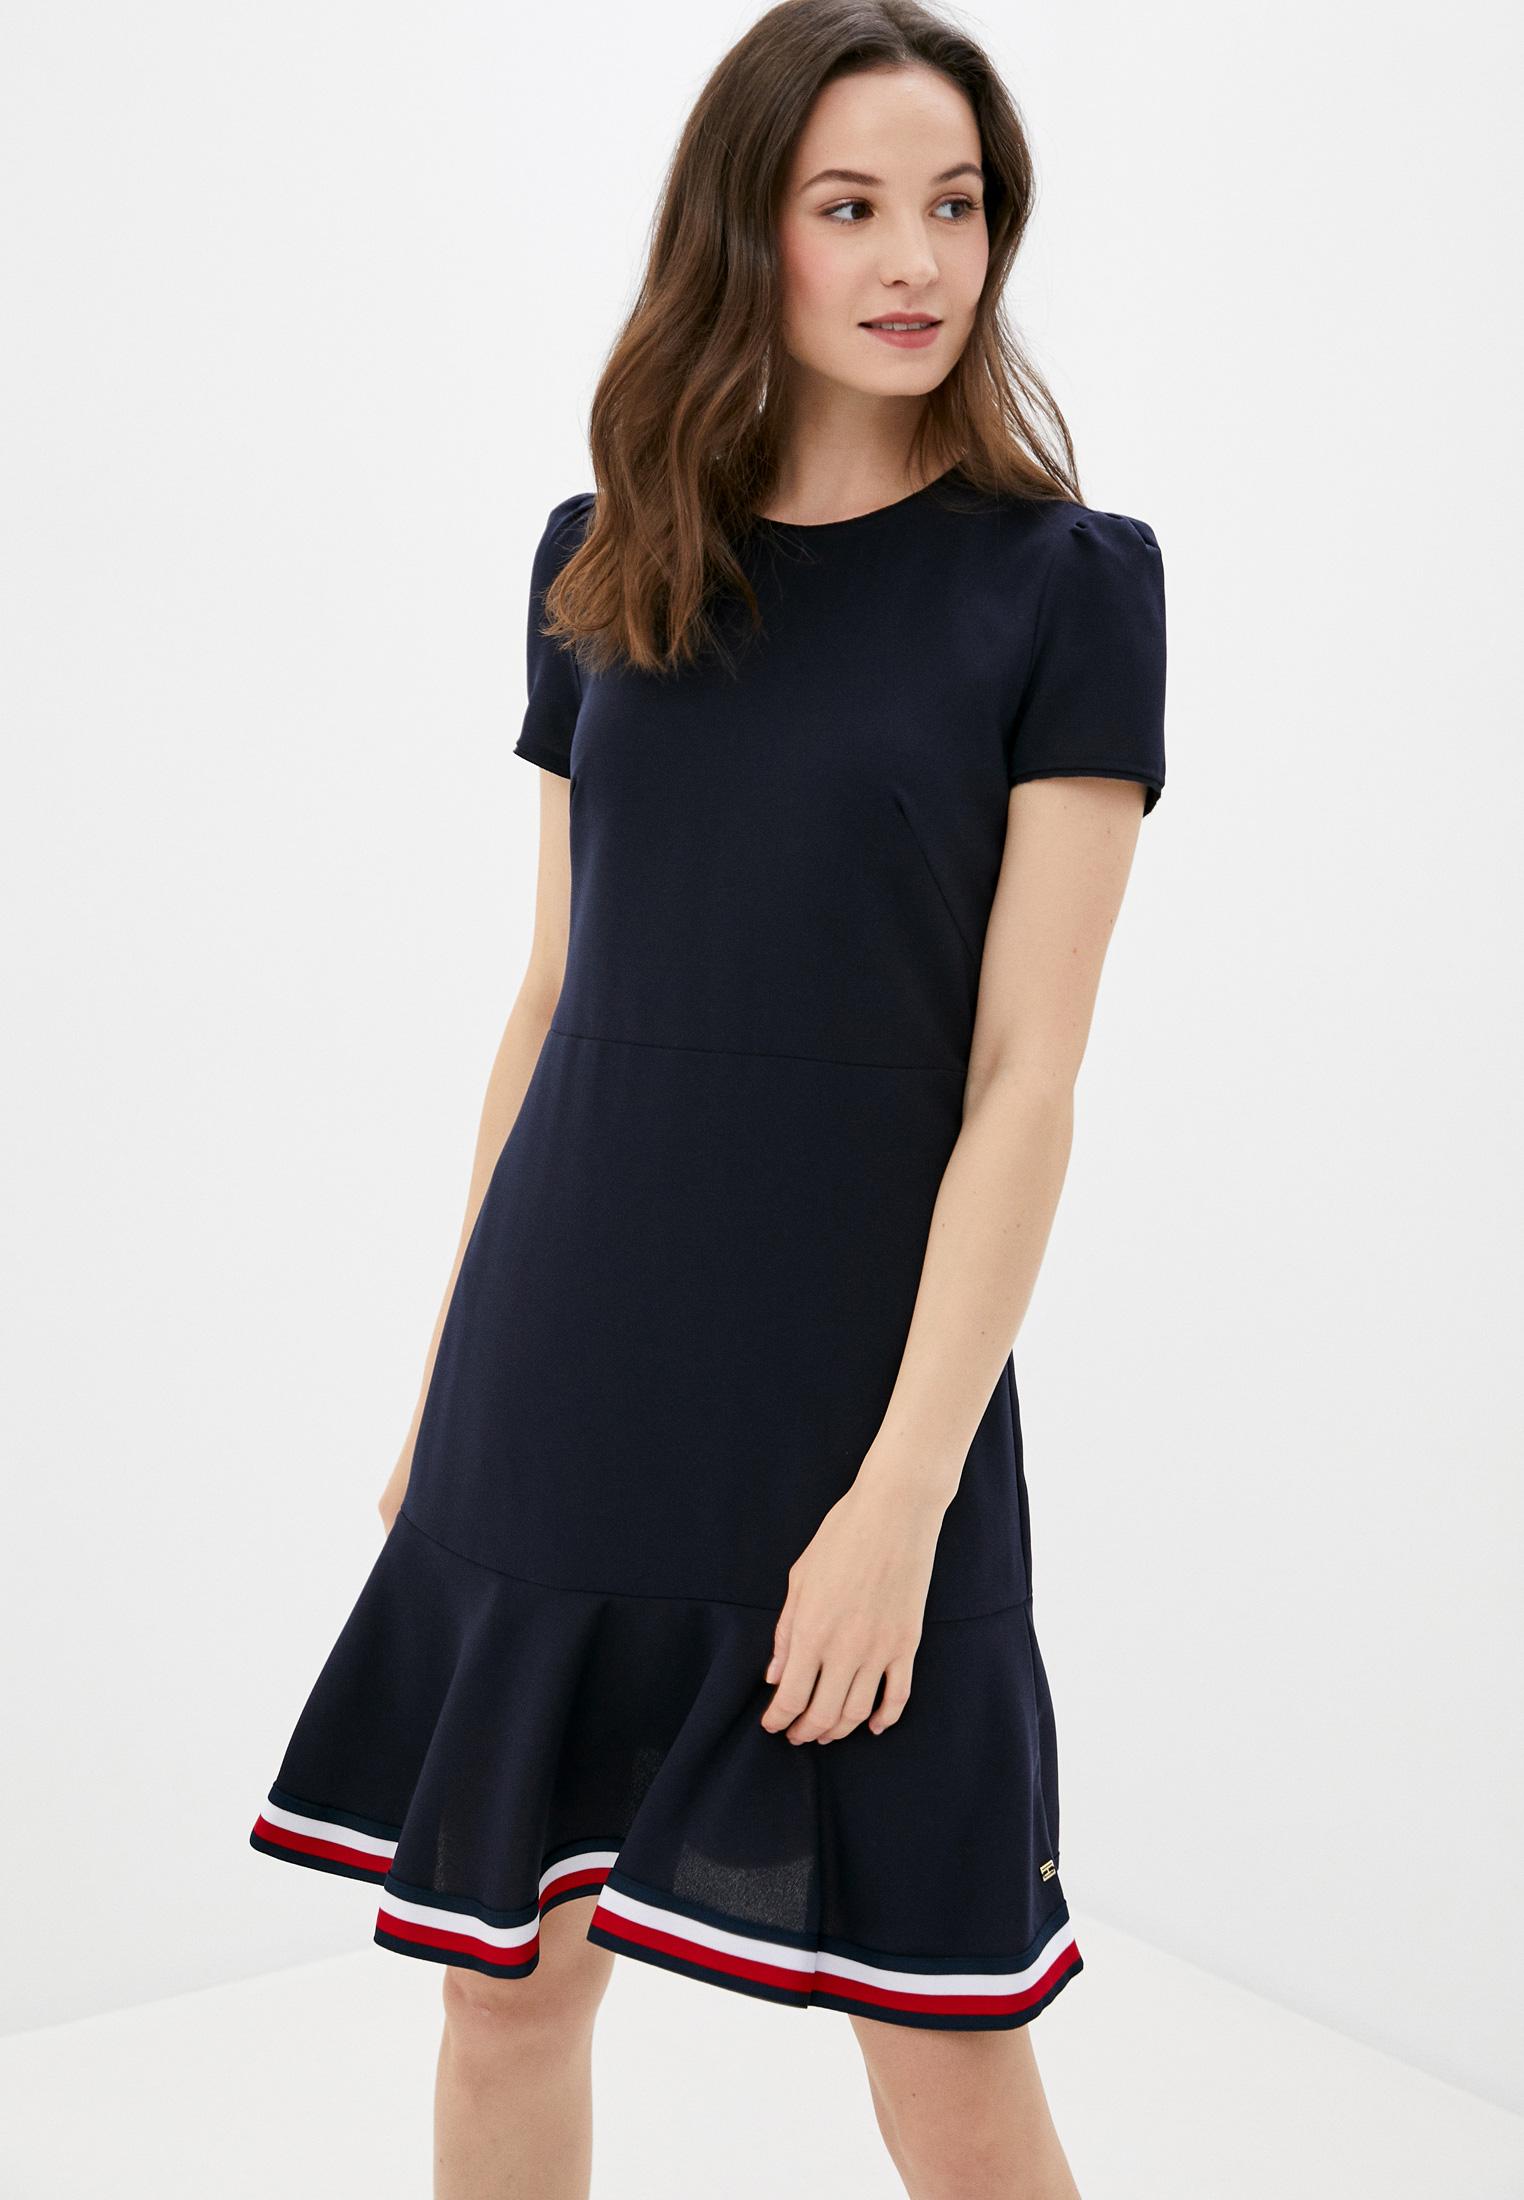 Платье Tommy Hilfiger (Томми Хилфигер) WW0WW28172